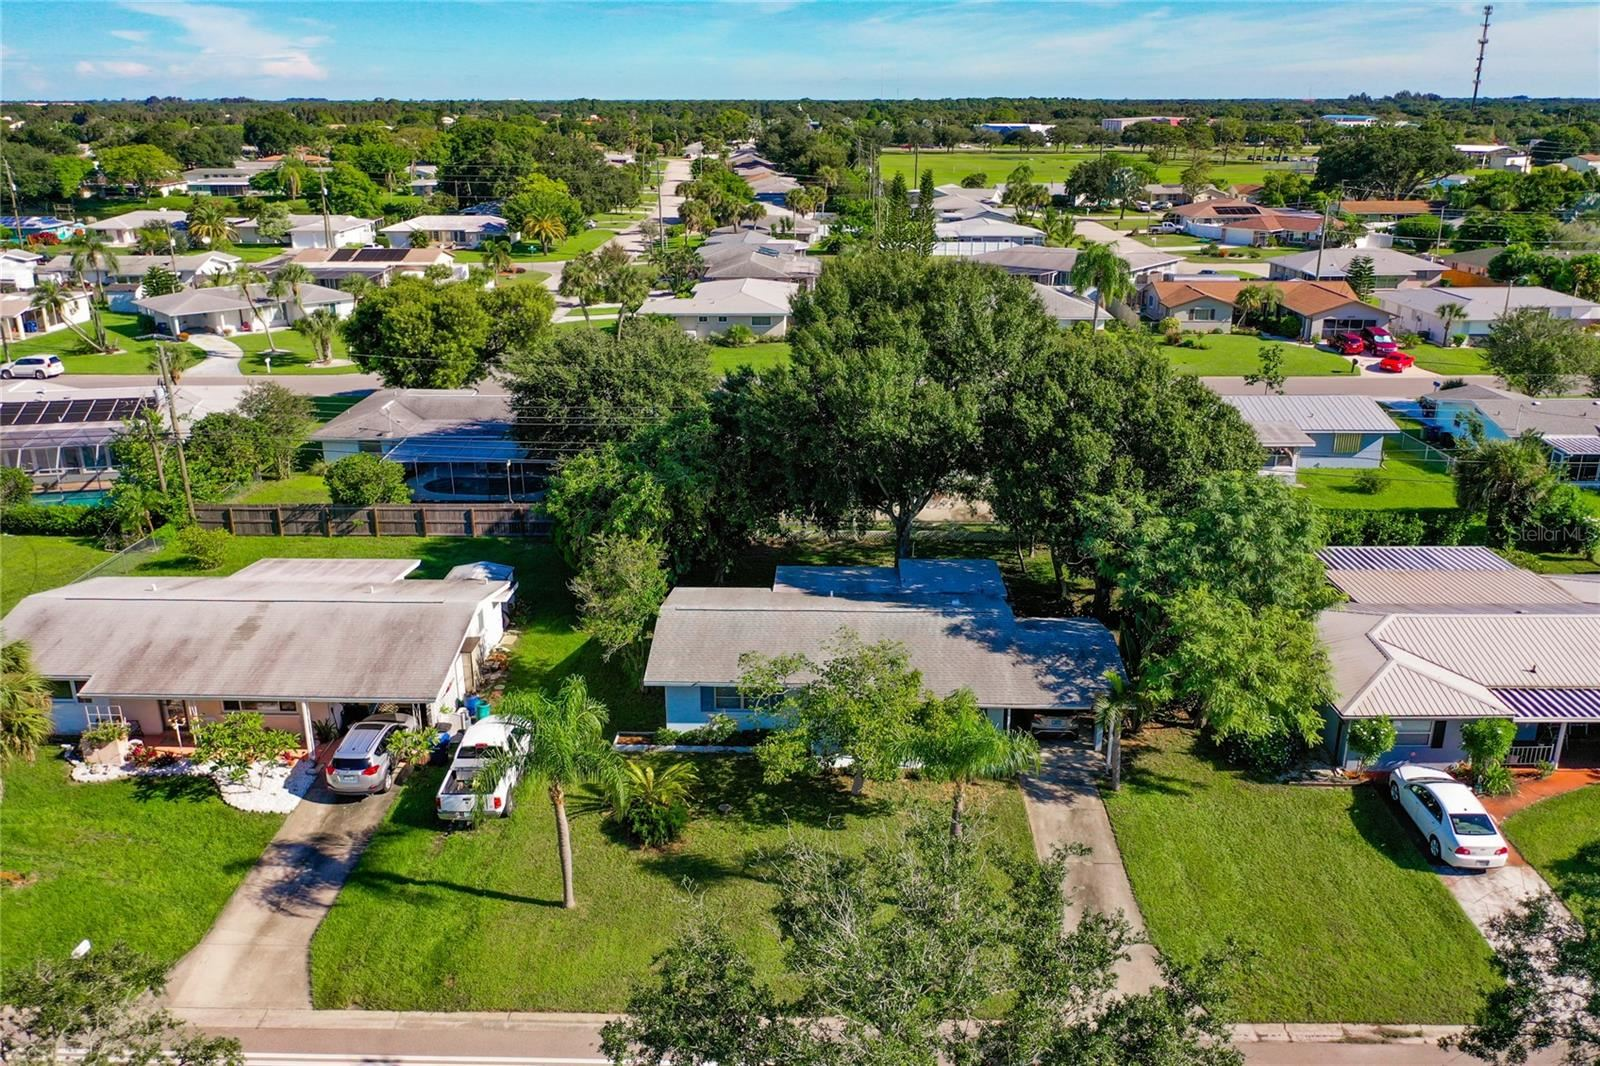 Photo of 617 SHAMROCK BOULEVARD, VENICE, FL 34293 (MLS # N6117703)